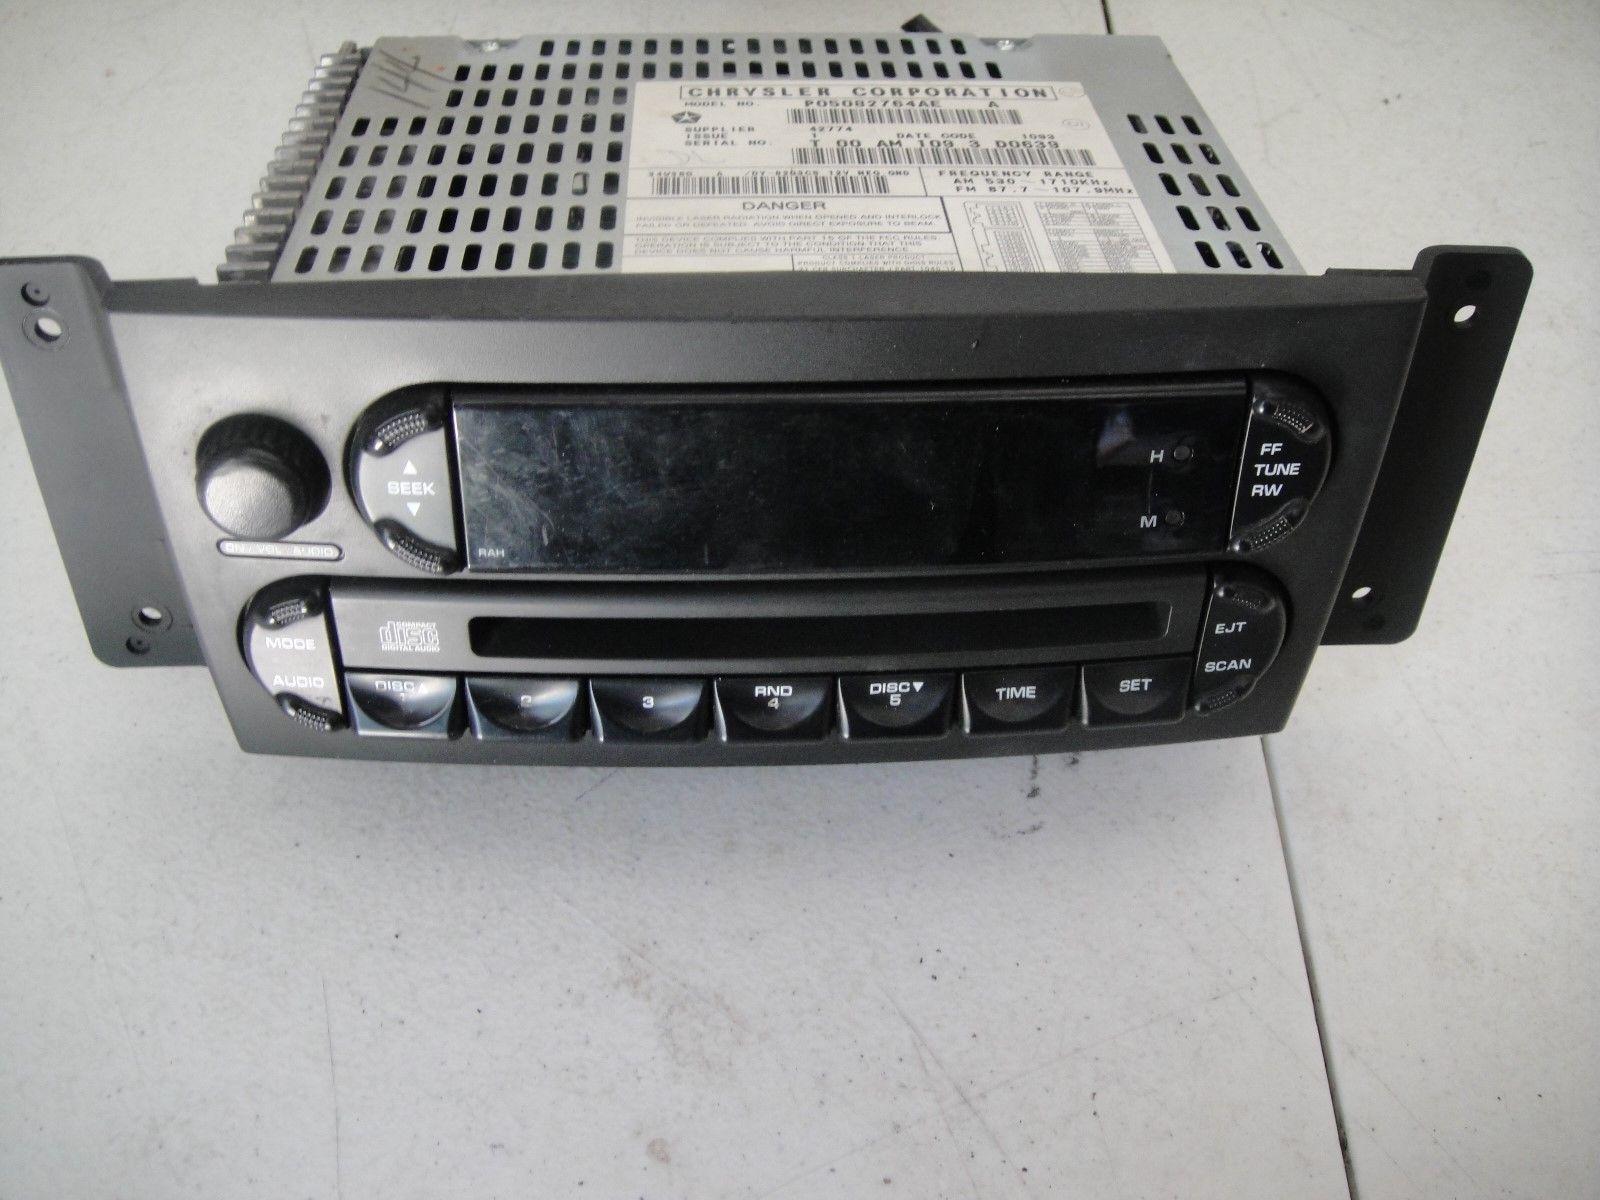 04 05 06 07 08 Chrysler Pacifica Radio Cd Player P05082764AE